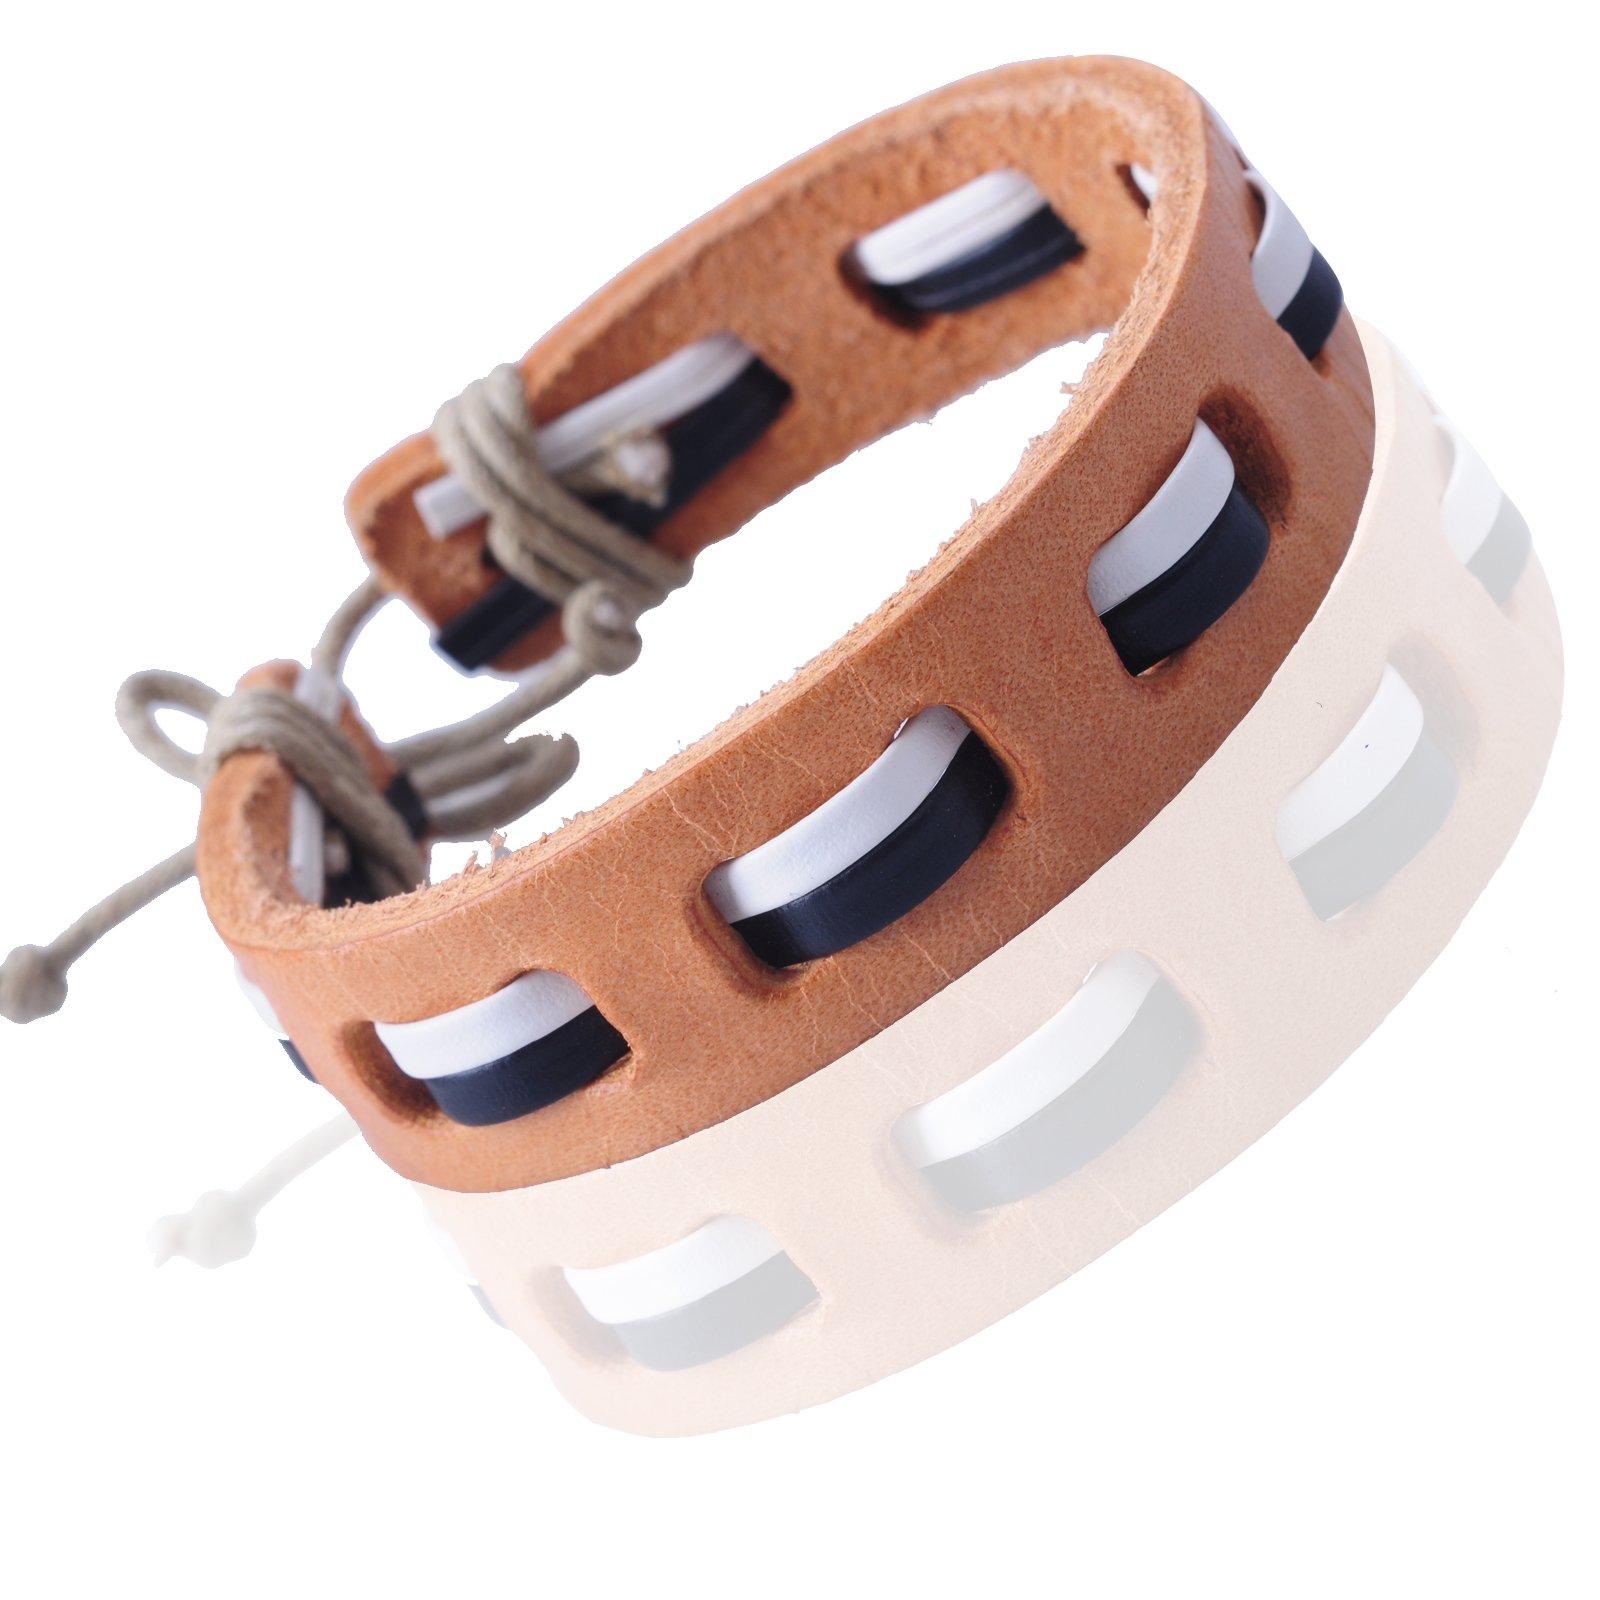 New-Fawn-Orange-Brown-Unisex-Genuine-Leather-Adjustable-Bracelets-Gift-086USANNA miniature 16